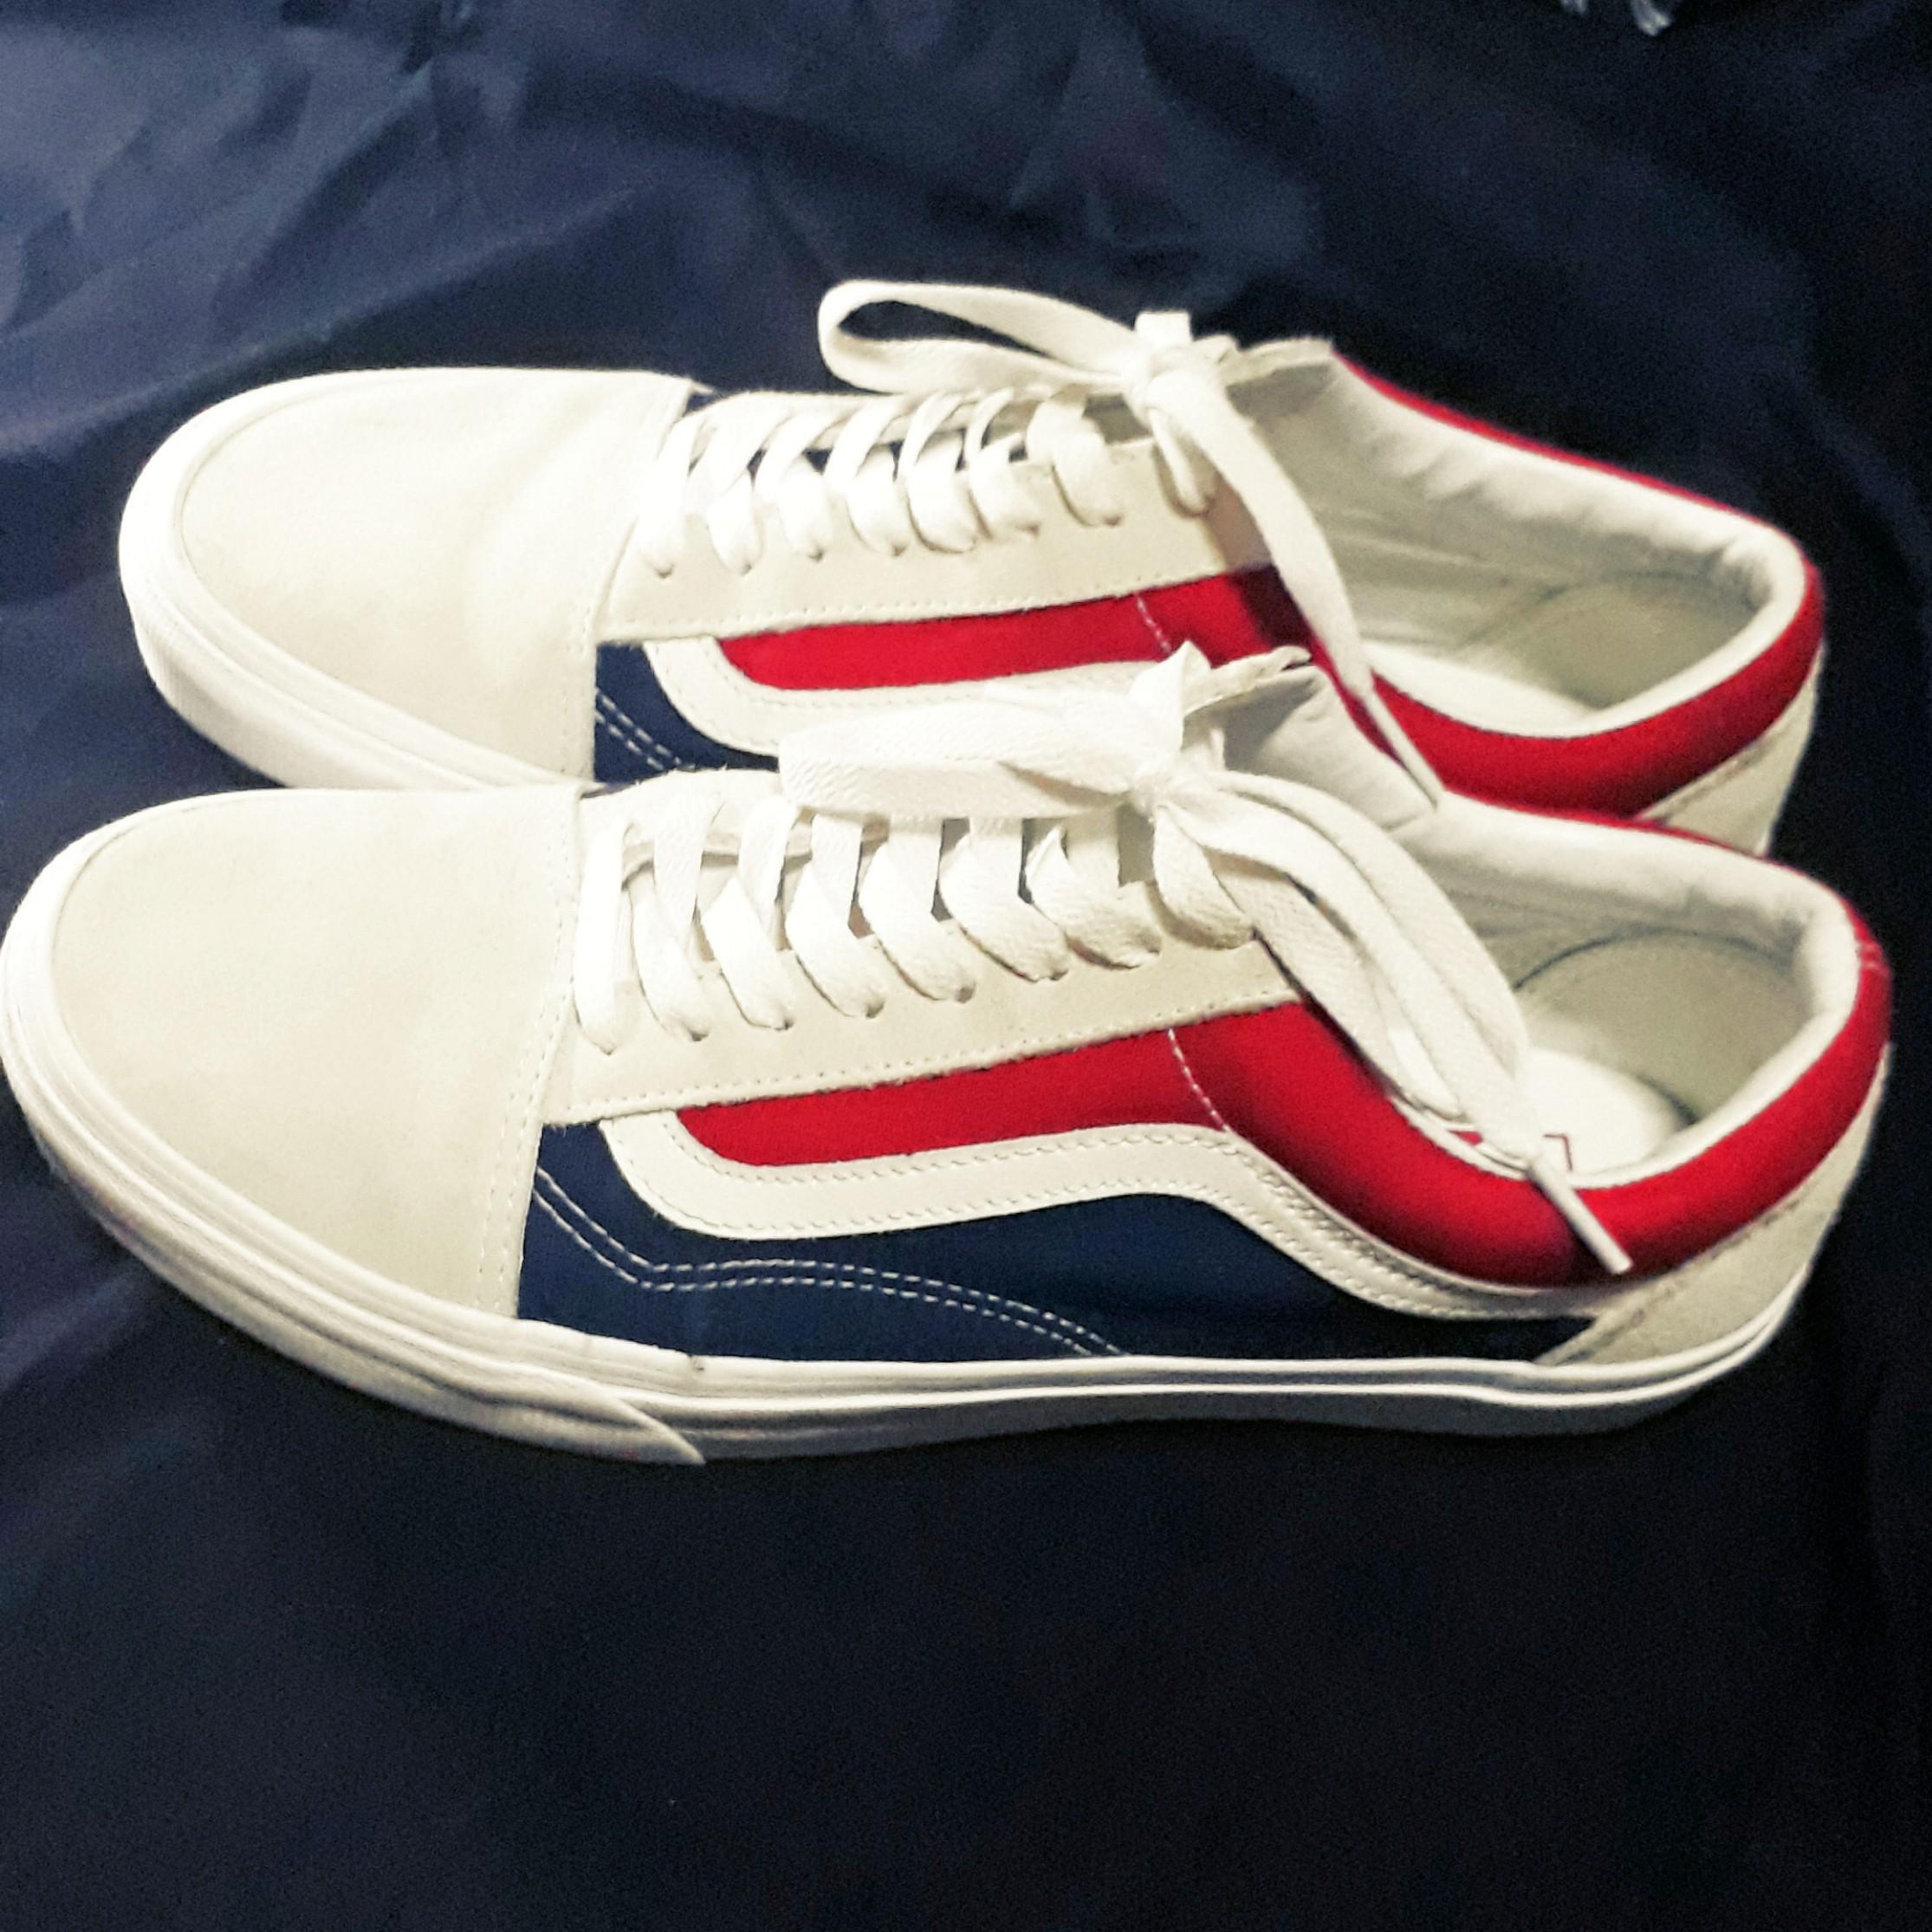 5522ab5237 Vans Old Skool retro block - tri color shoes